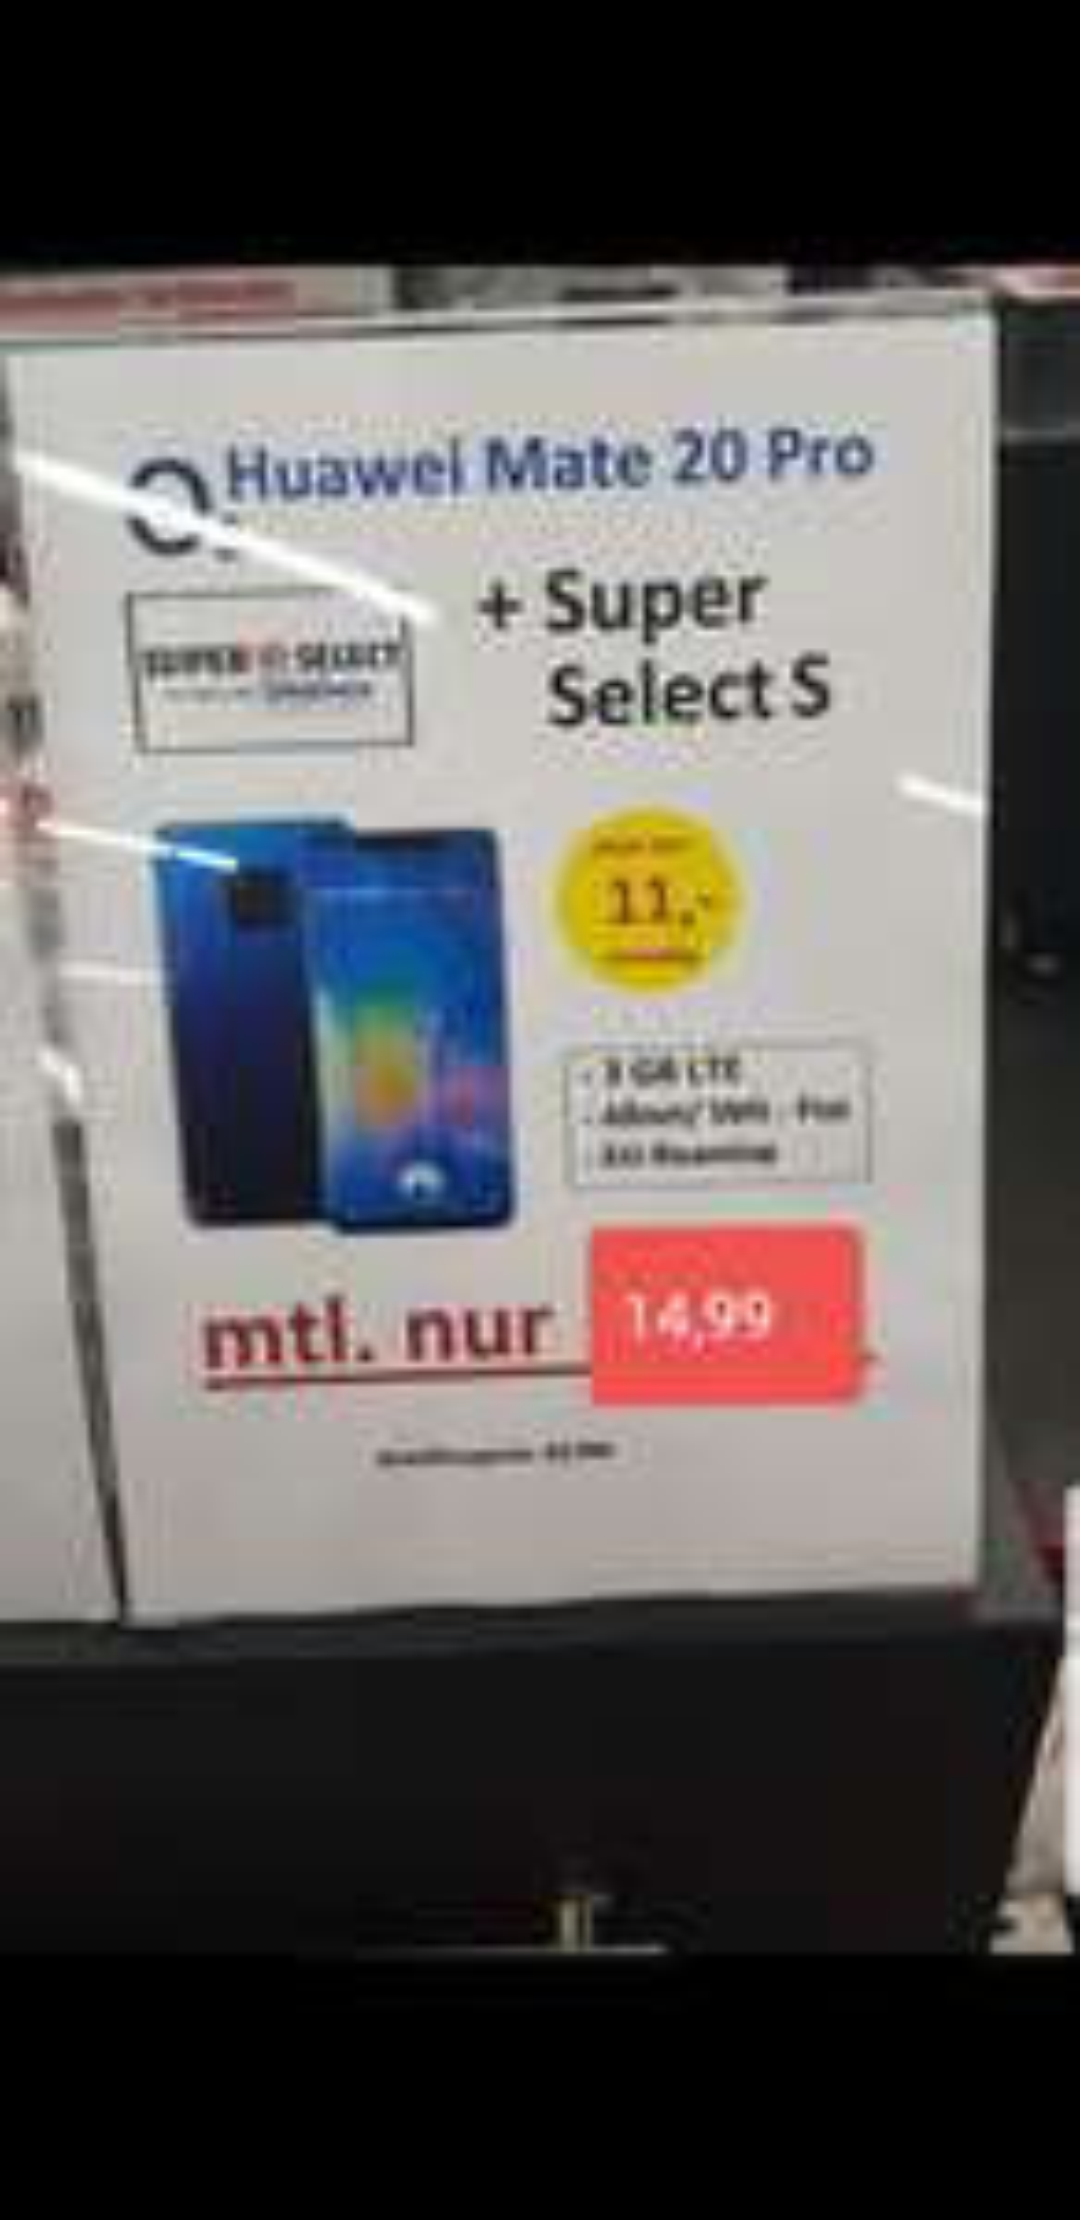 (Lokal?)/ Offline/ MEDIAMARKT: SUPER SELECT 3GB ALLNET FLAT MIT HUAWEI MATE 20 PRO FÜR 14,99€ Mntl.